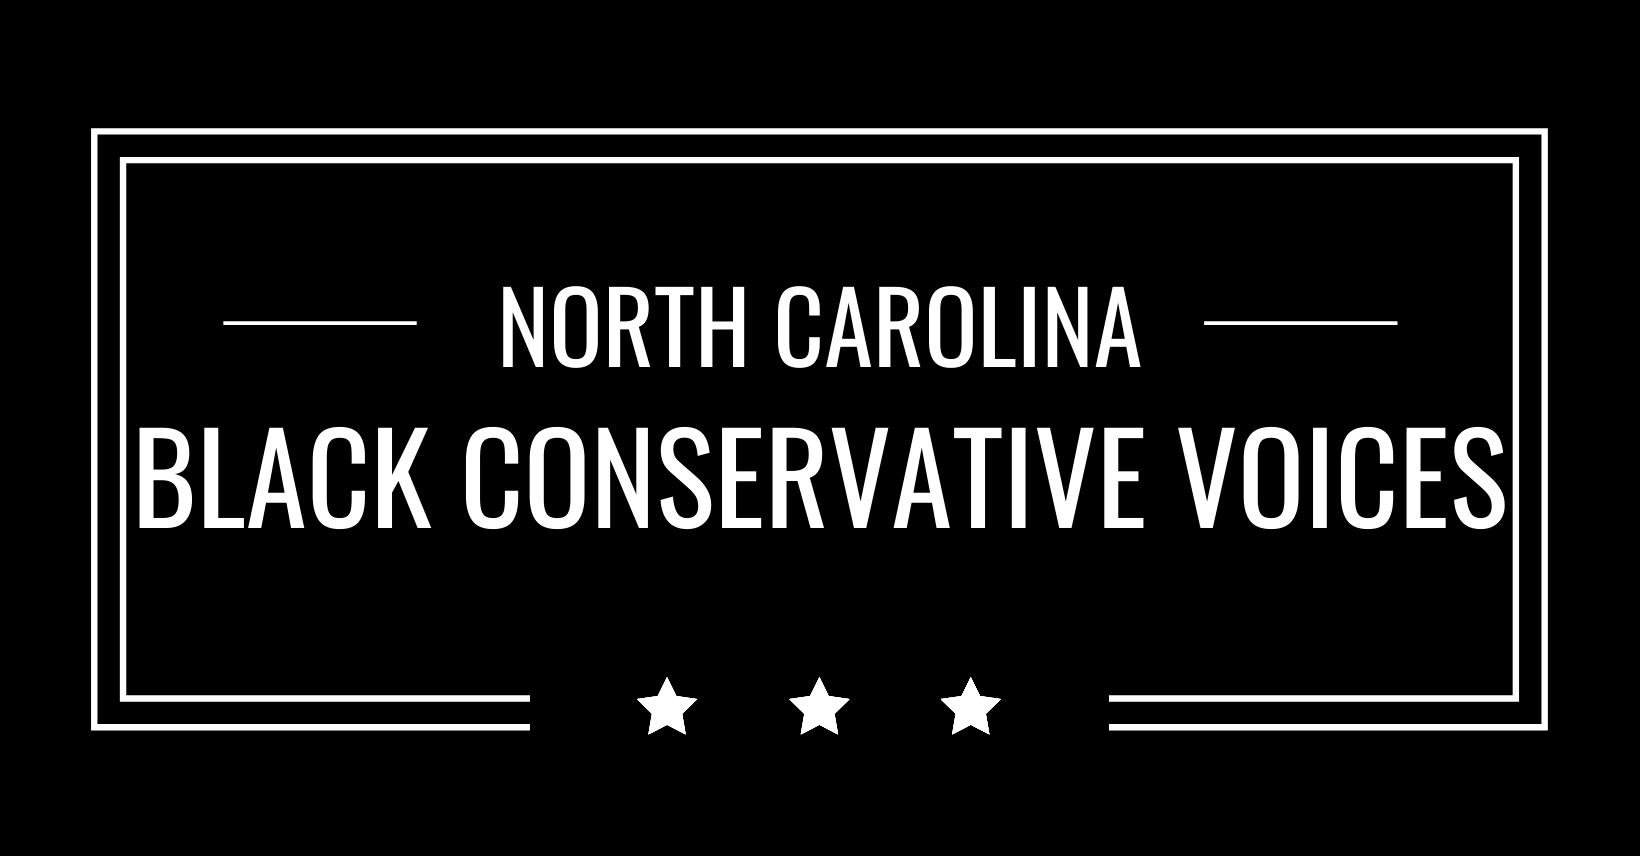 North Carolina Black Conservative Voices